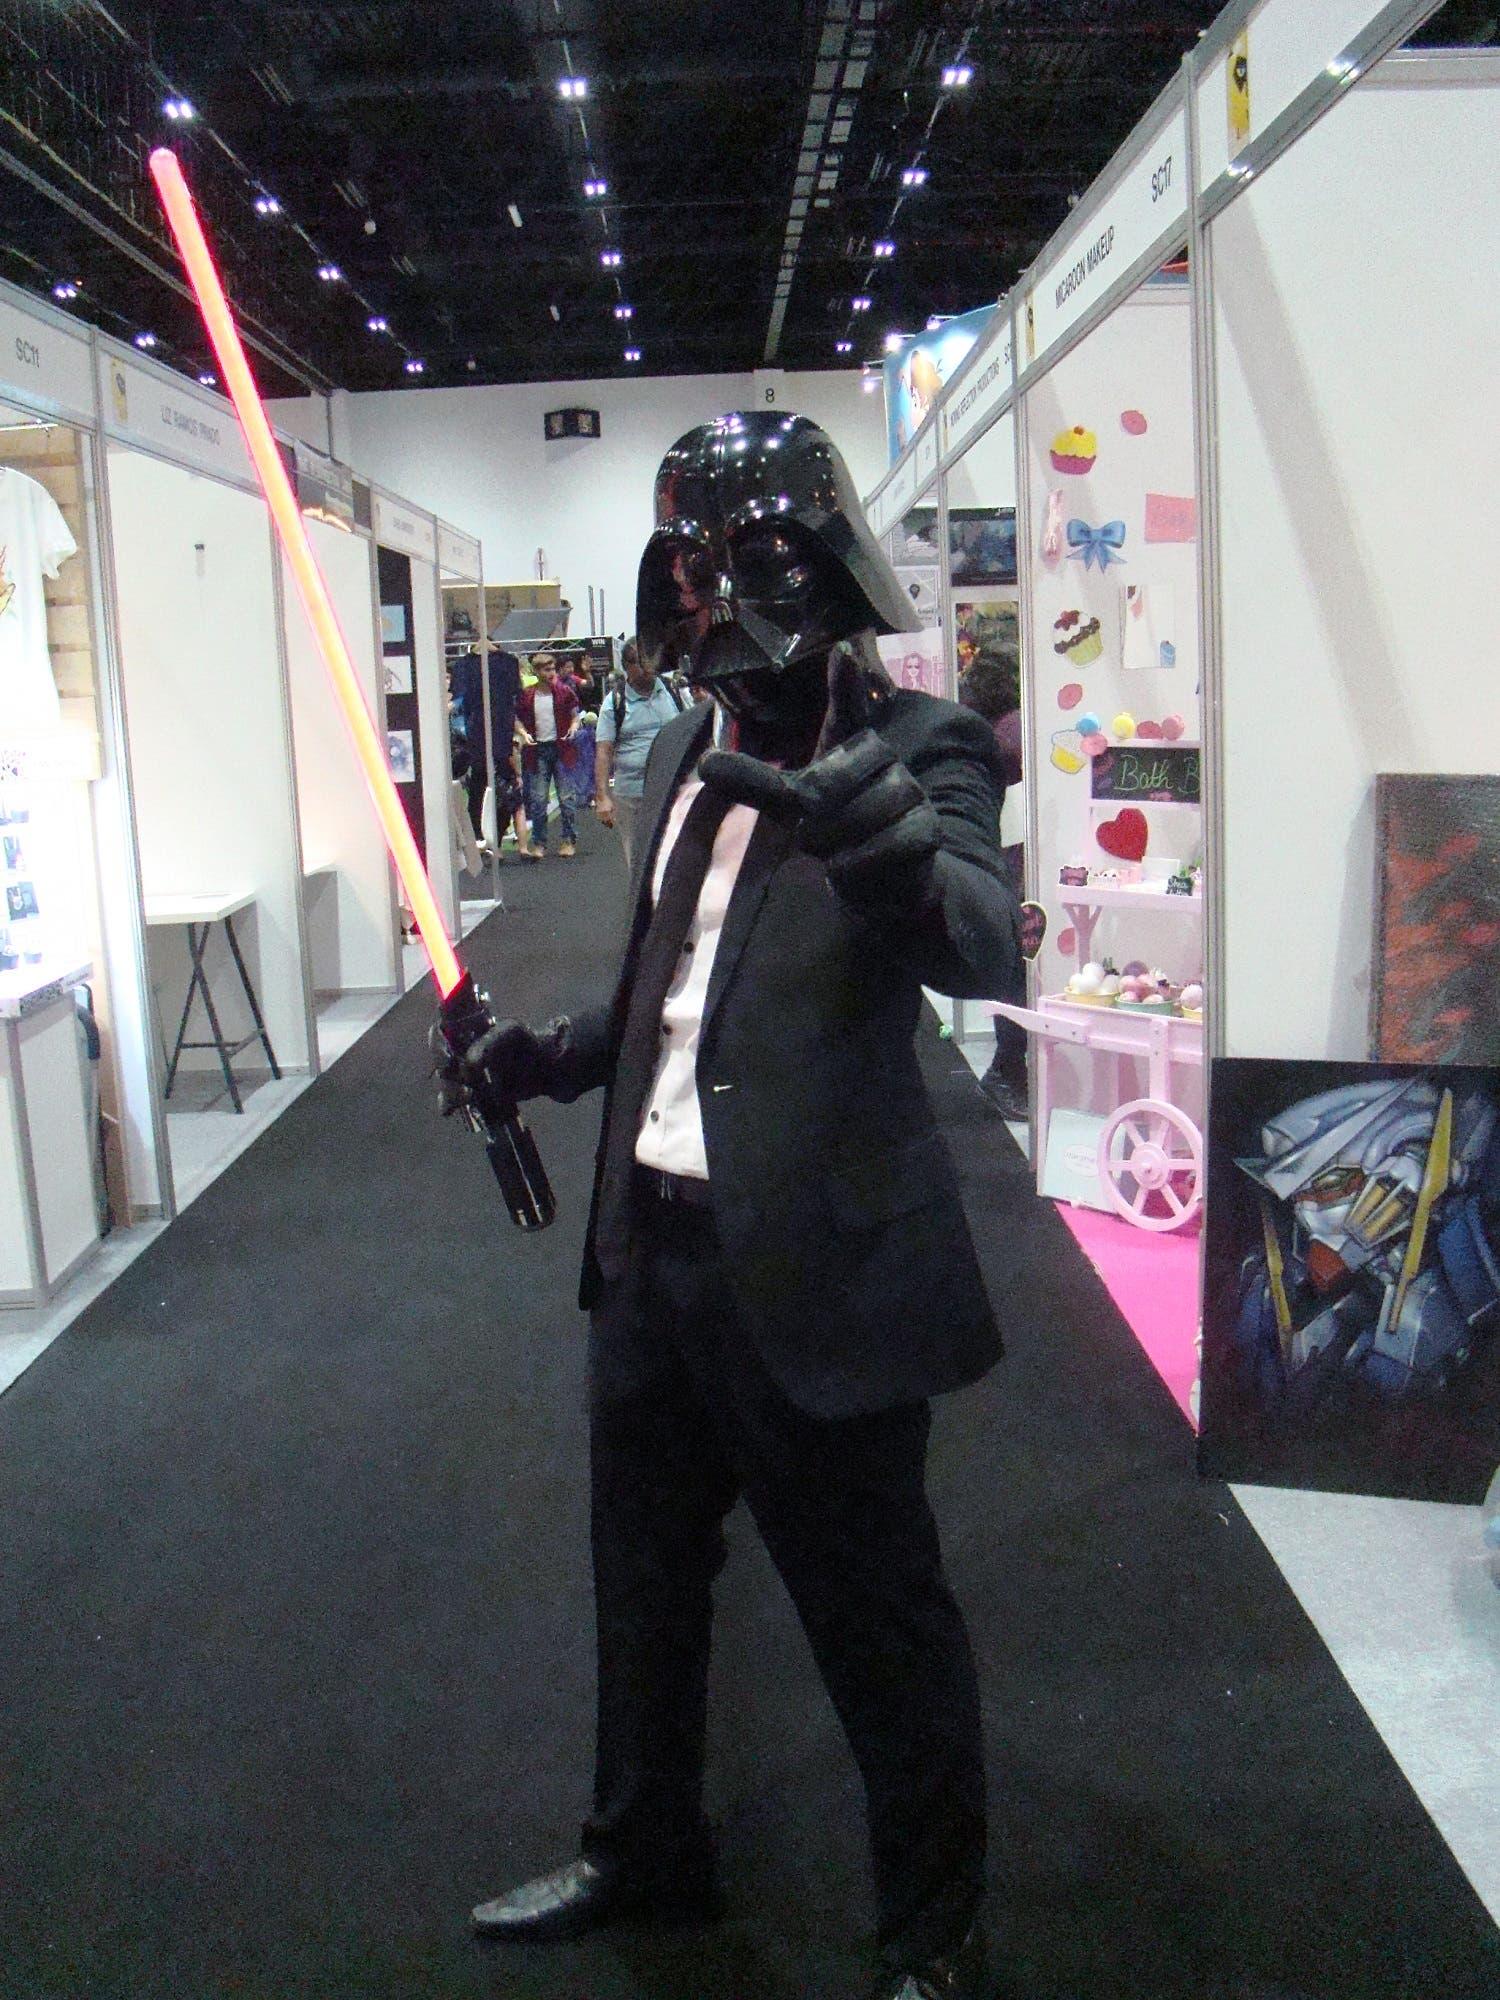 A cosplayer for suited up Darth Vader at MEFCC 2016. (Tarek Ali Ahmad, Al Arabiya English)